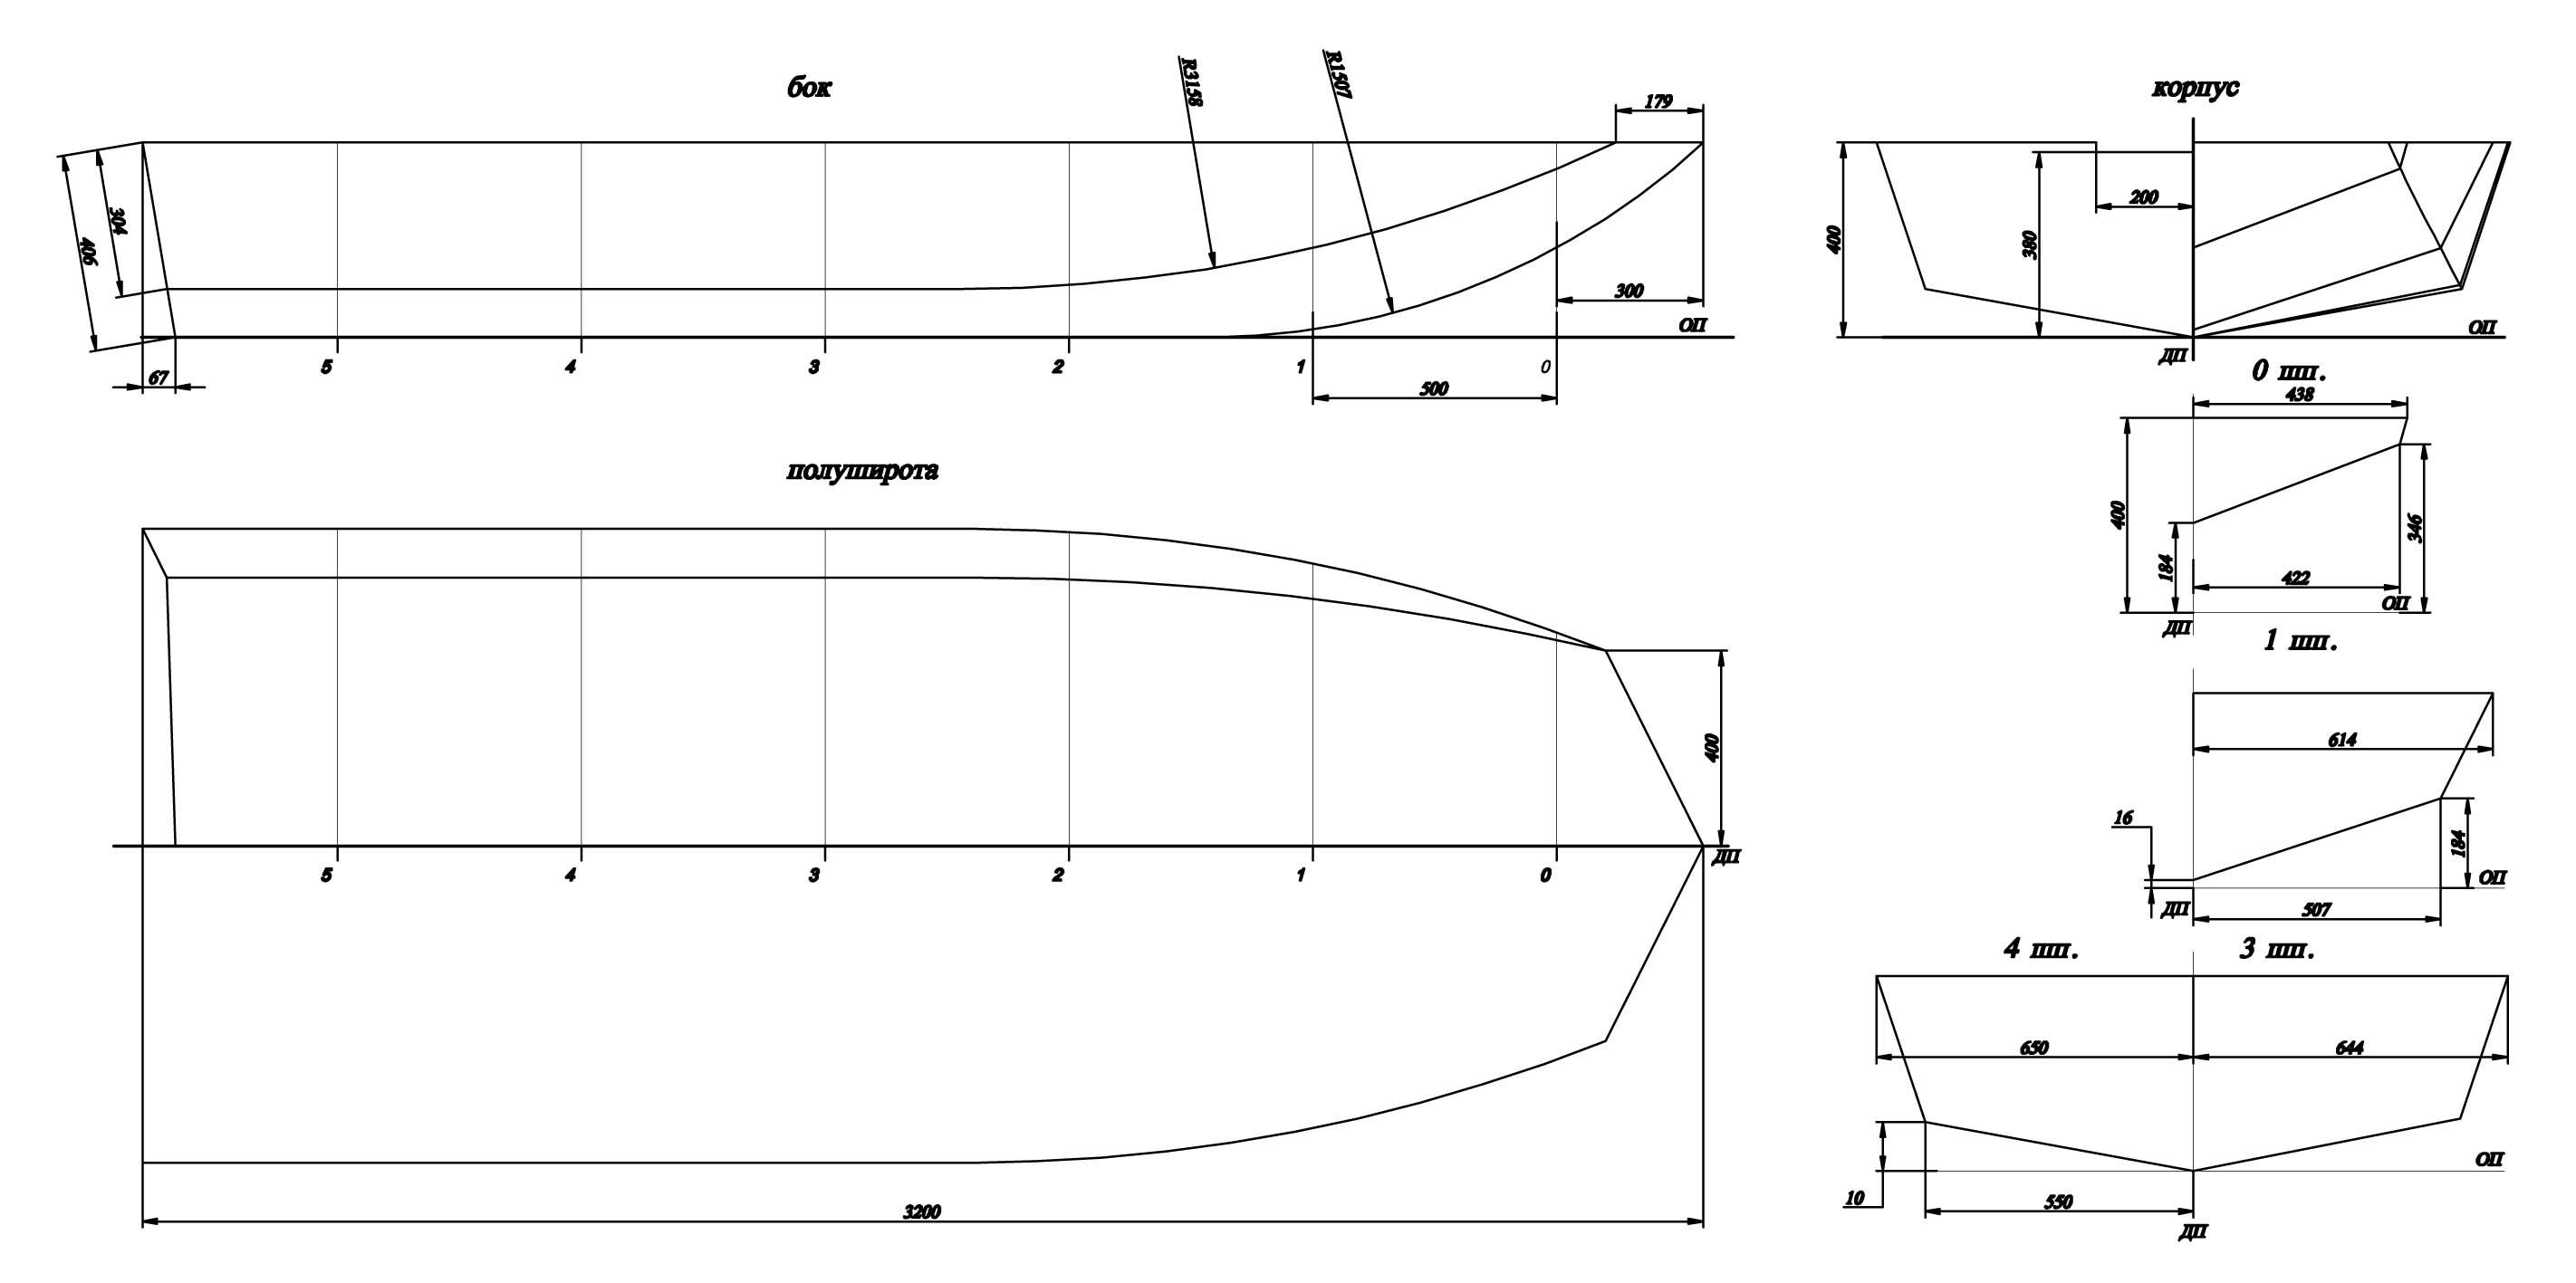 Болотоход для лодки своими руками чертежи 73